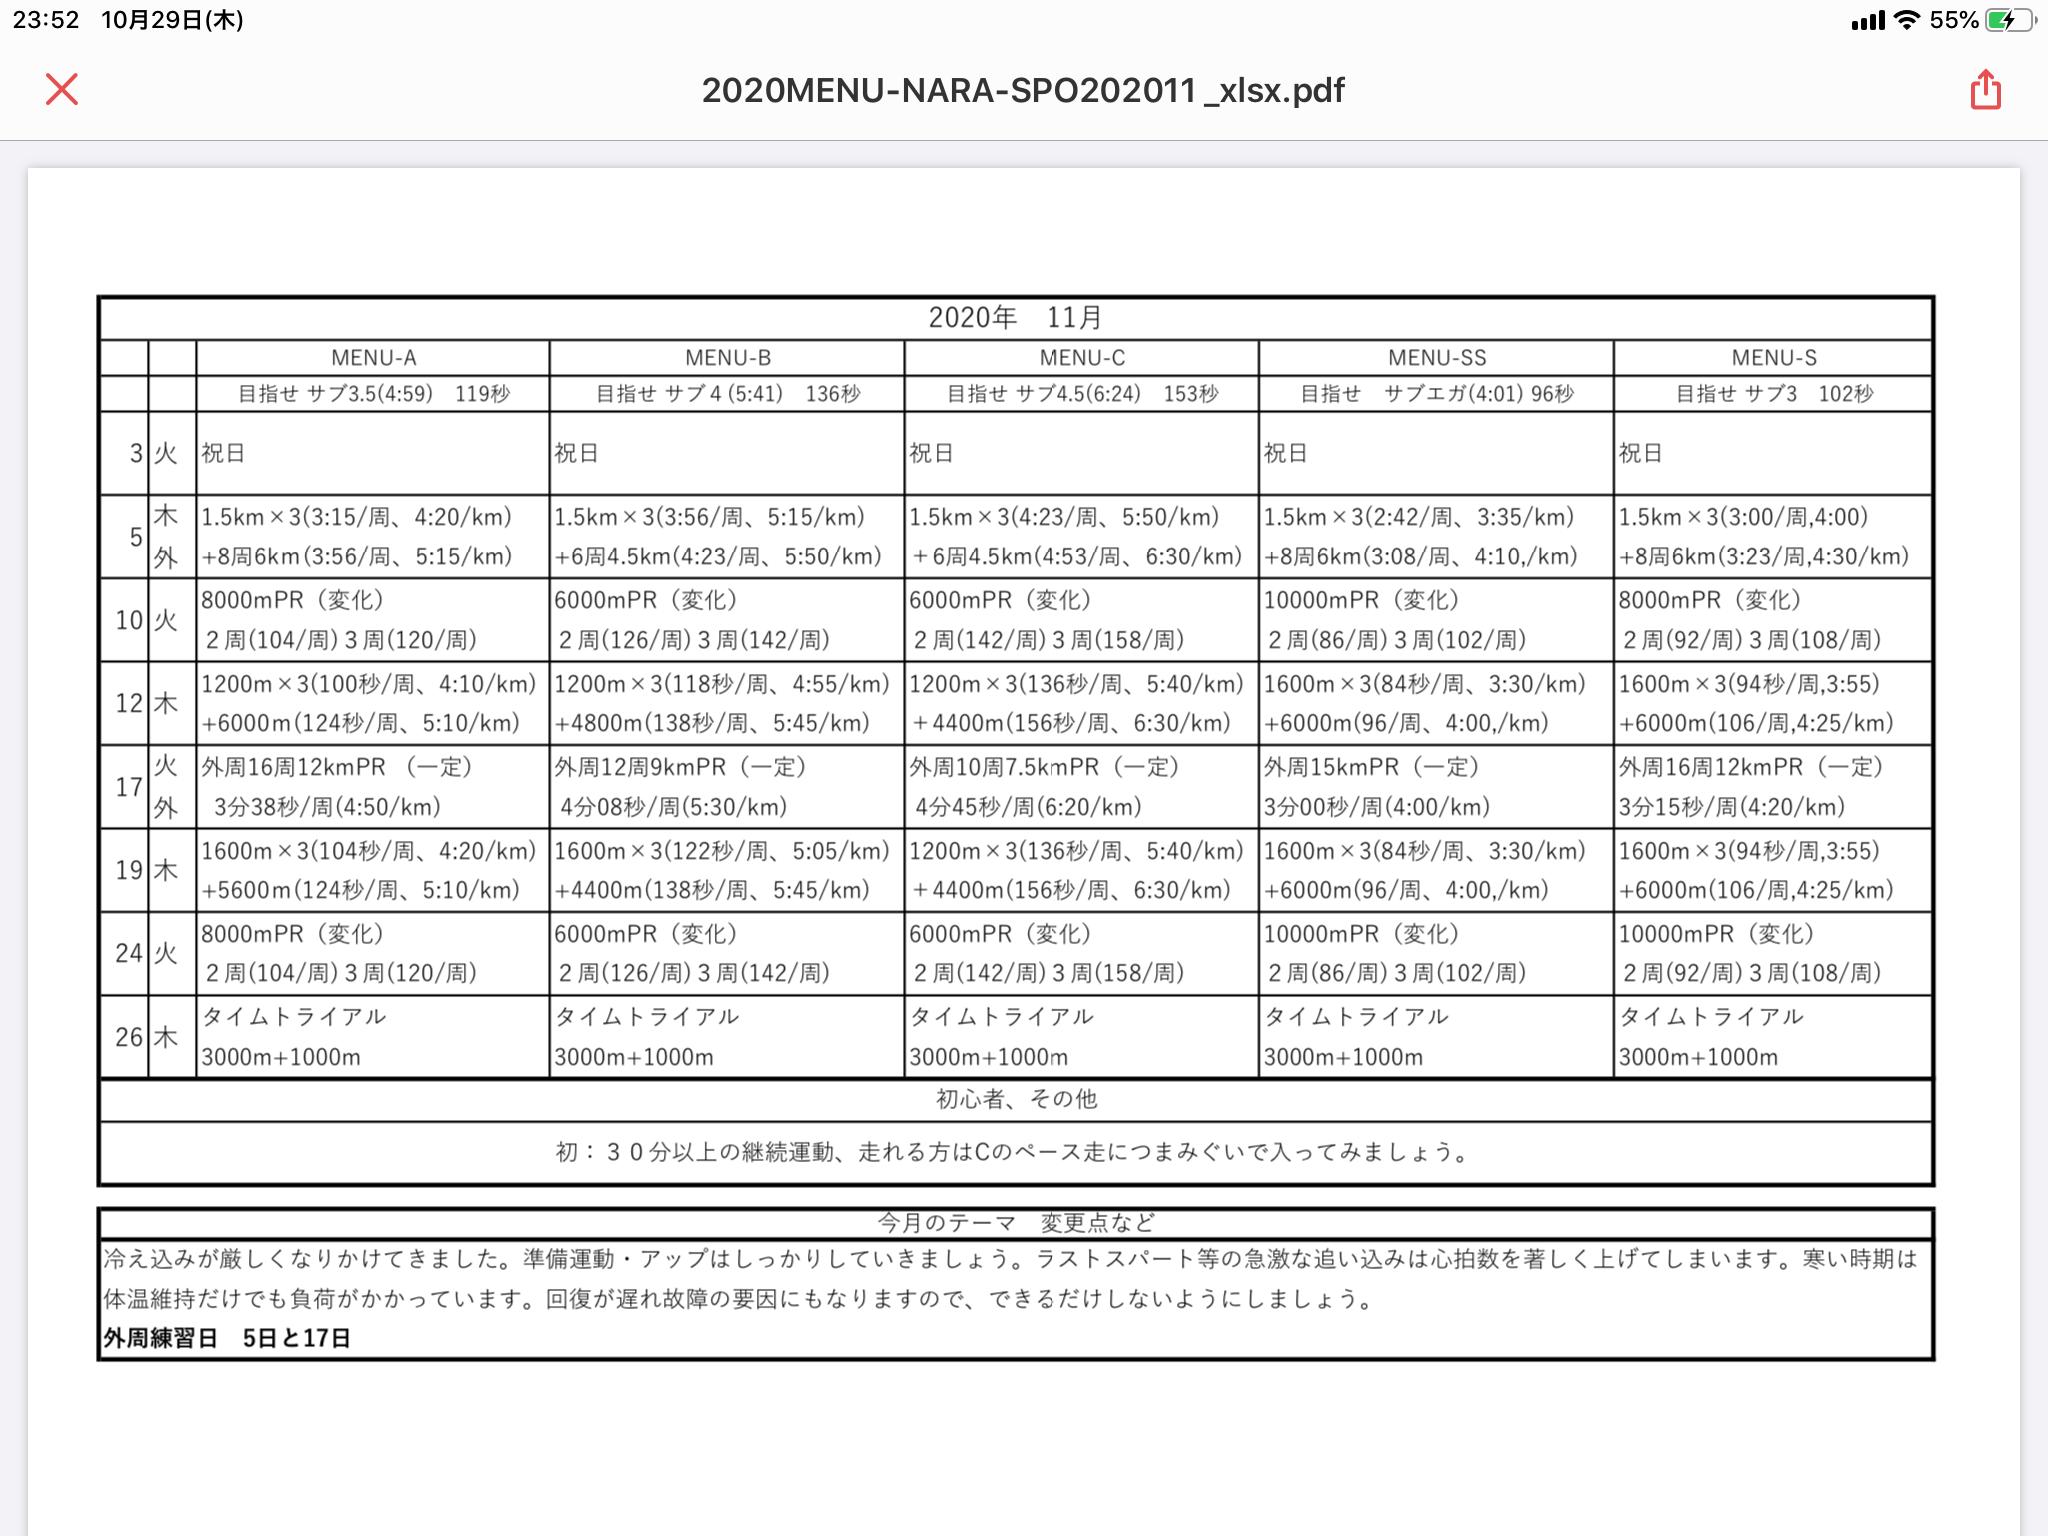 A79B6C56-E255-4D01-A51C-E0C038F93100